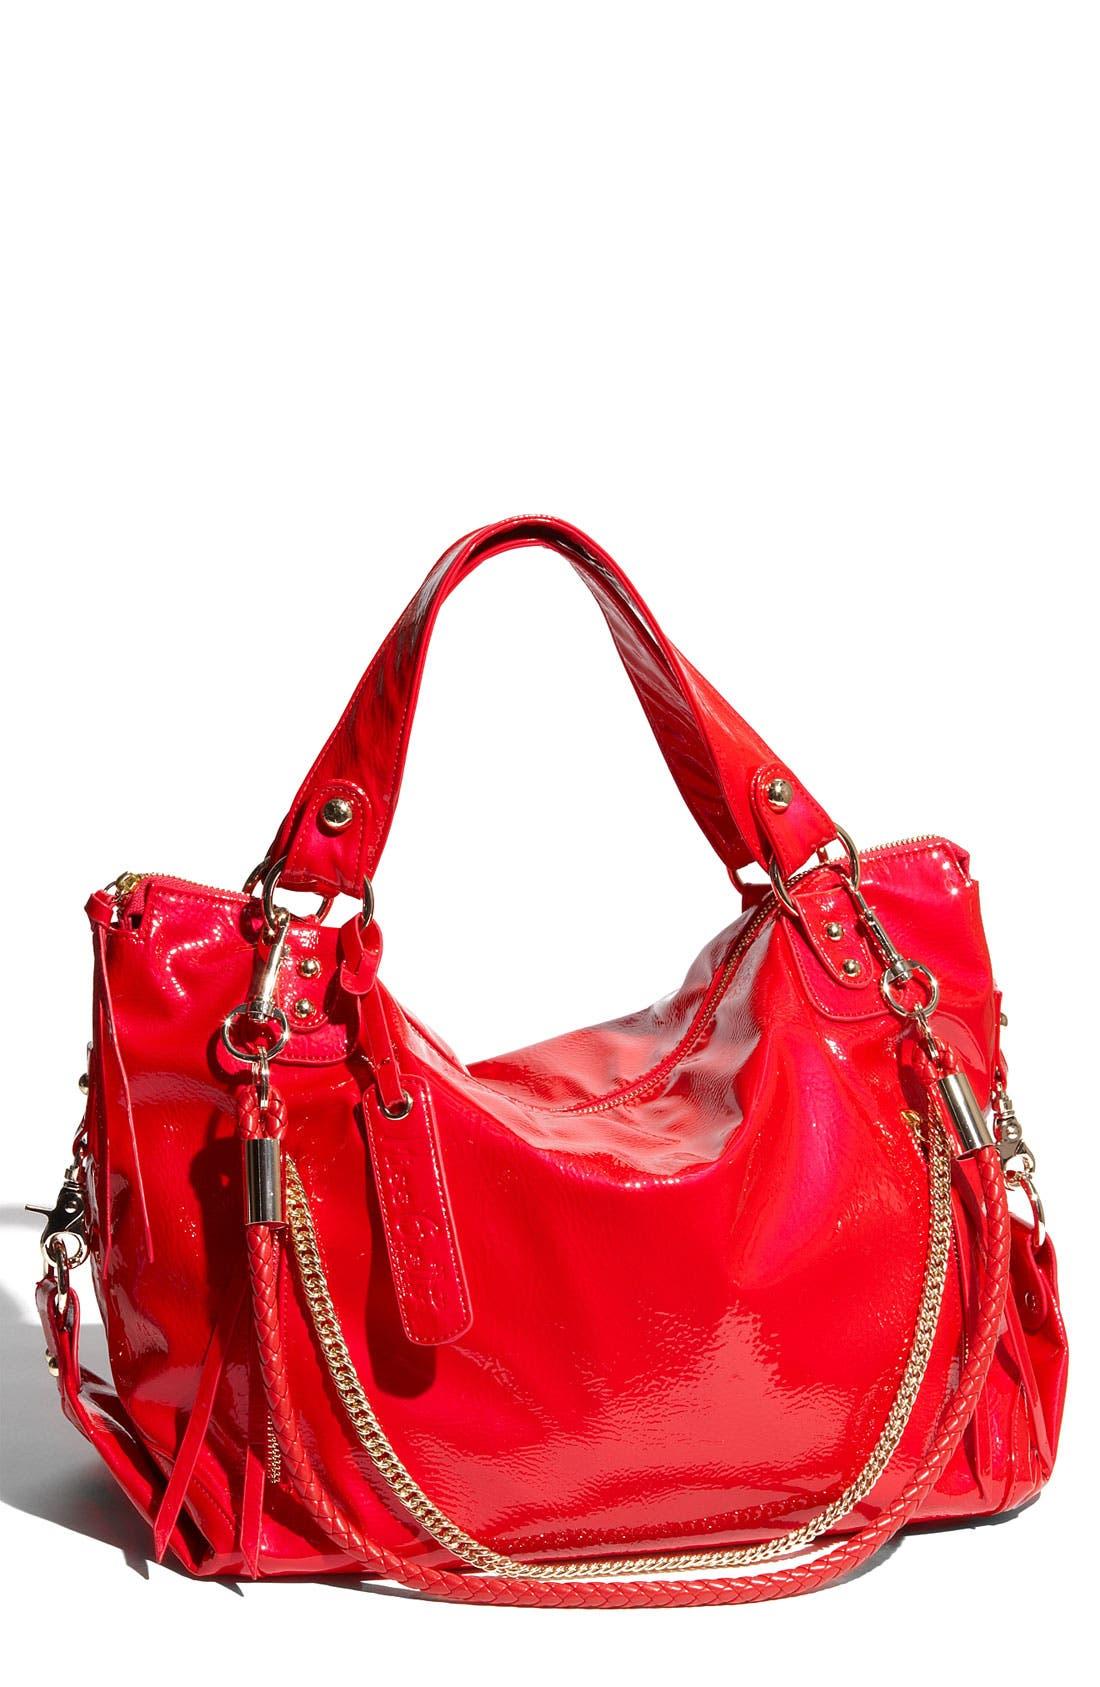 Main Image - Miss Gustto 'Bonnie' Faux Patent Leather Shopper